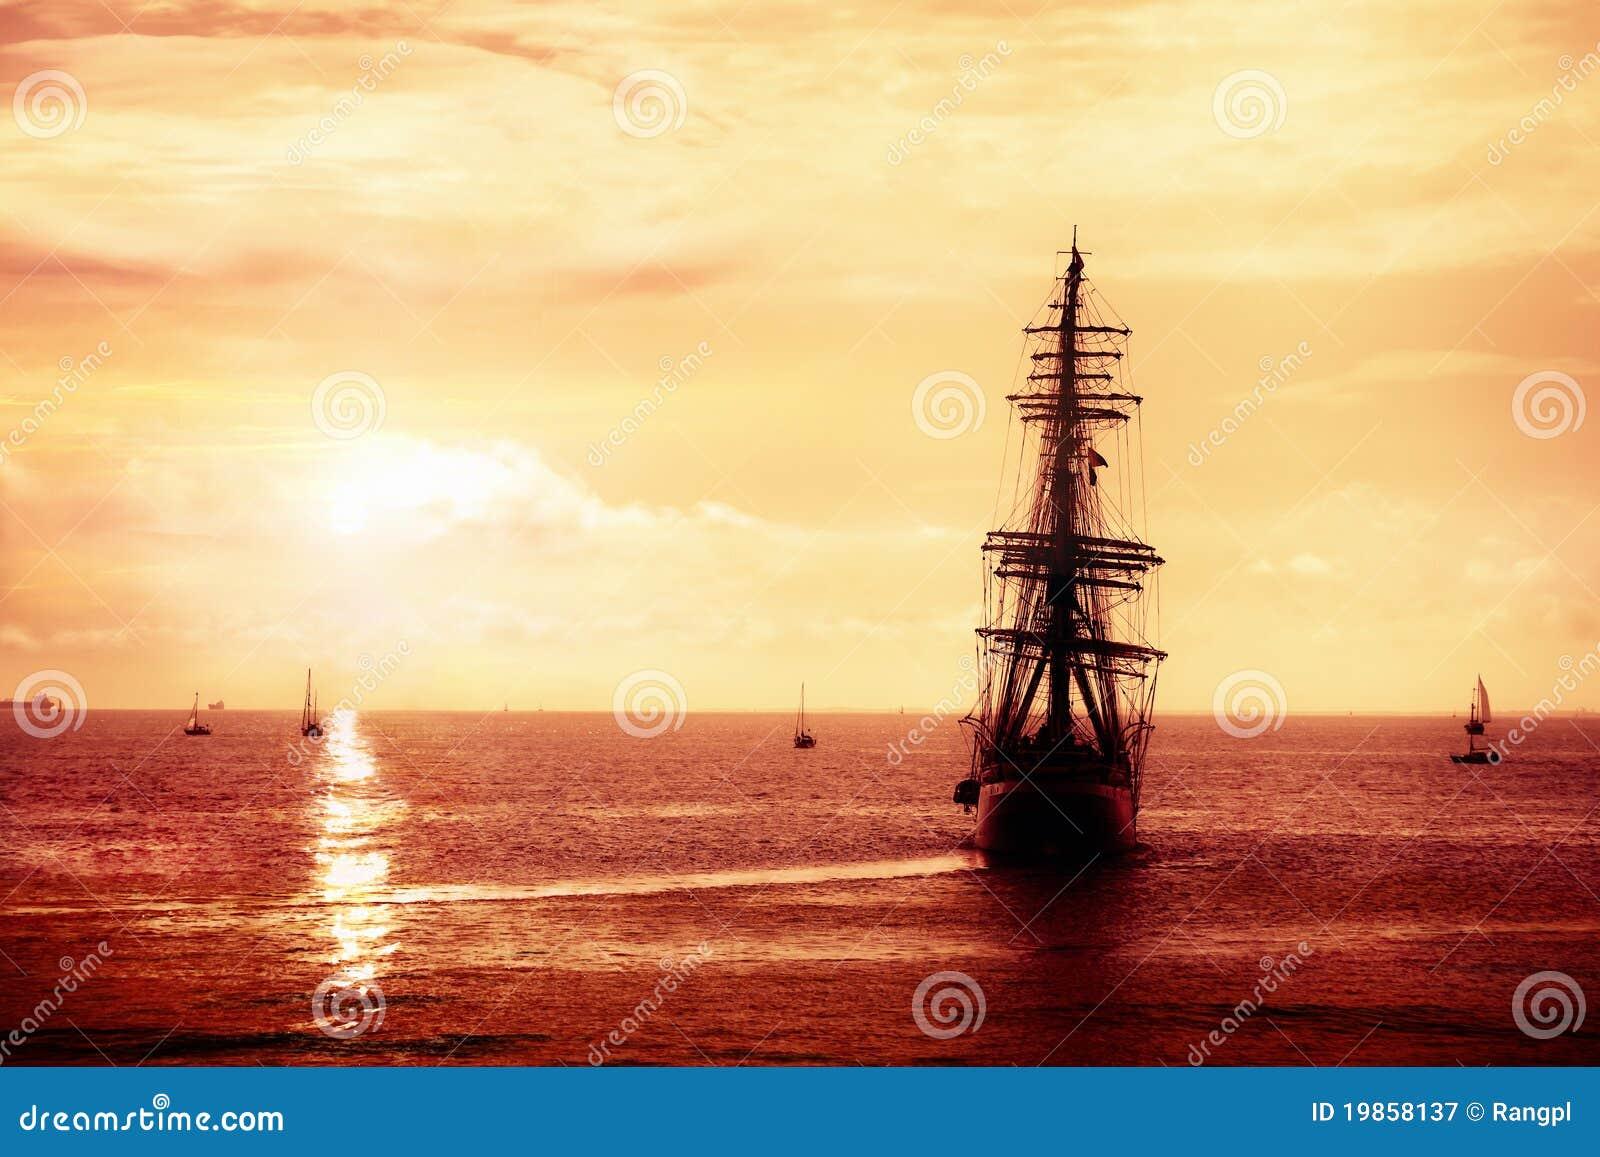 Pirate ship sailing